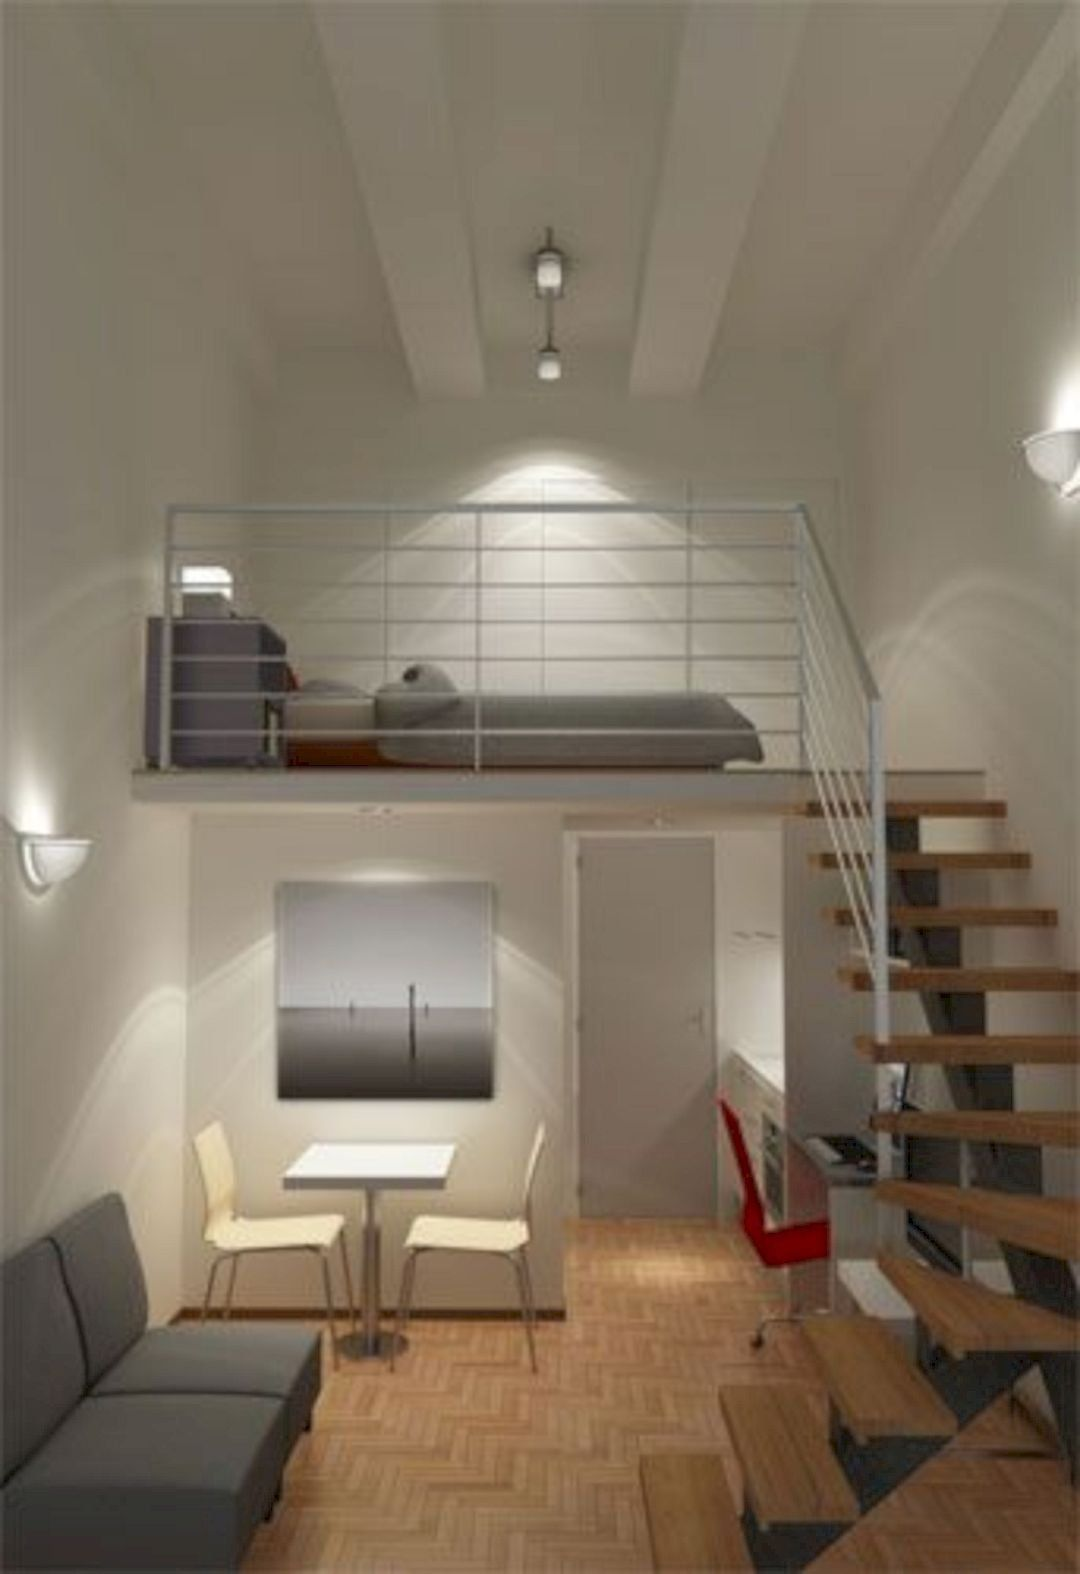 15 Superb Loft Furniture Ideas You Should Consider Having With